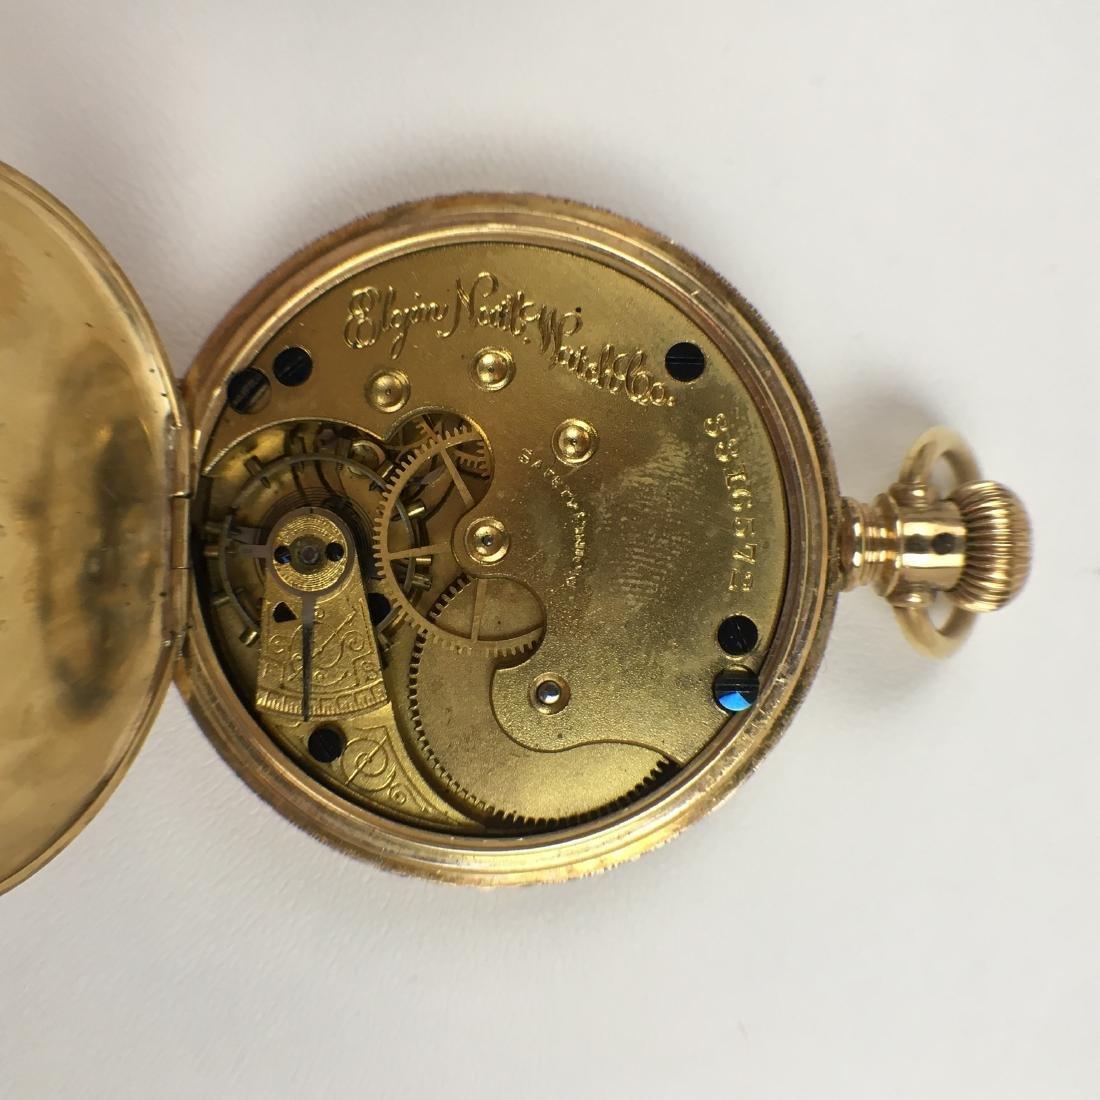 ANTIQUE 14K YELLOW GOLD ELGIN POCKET WATCH - 9